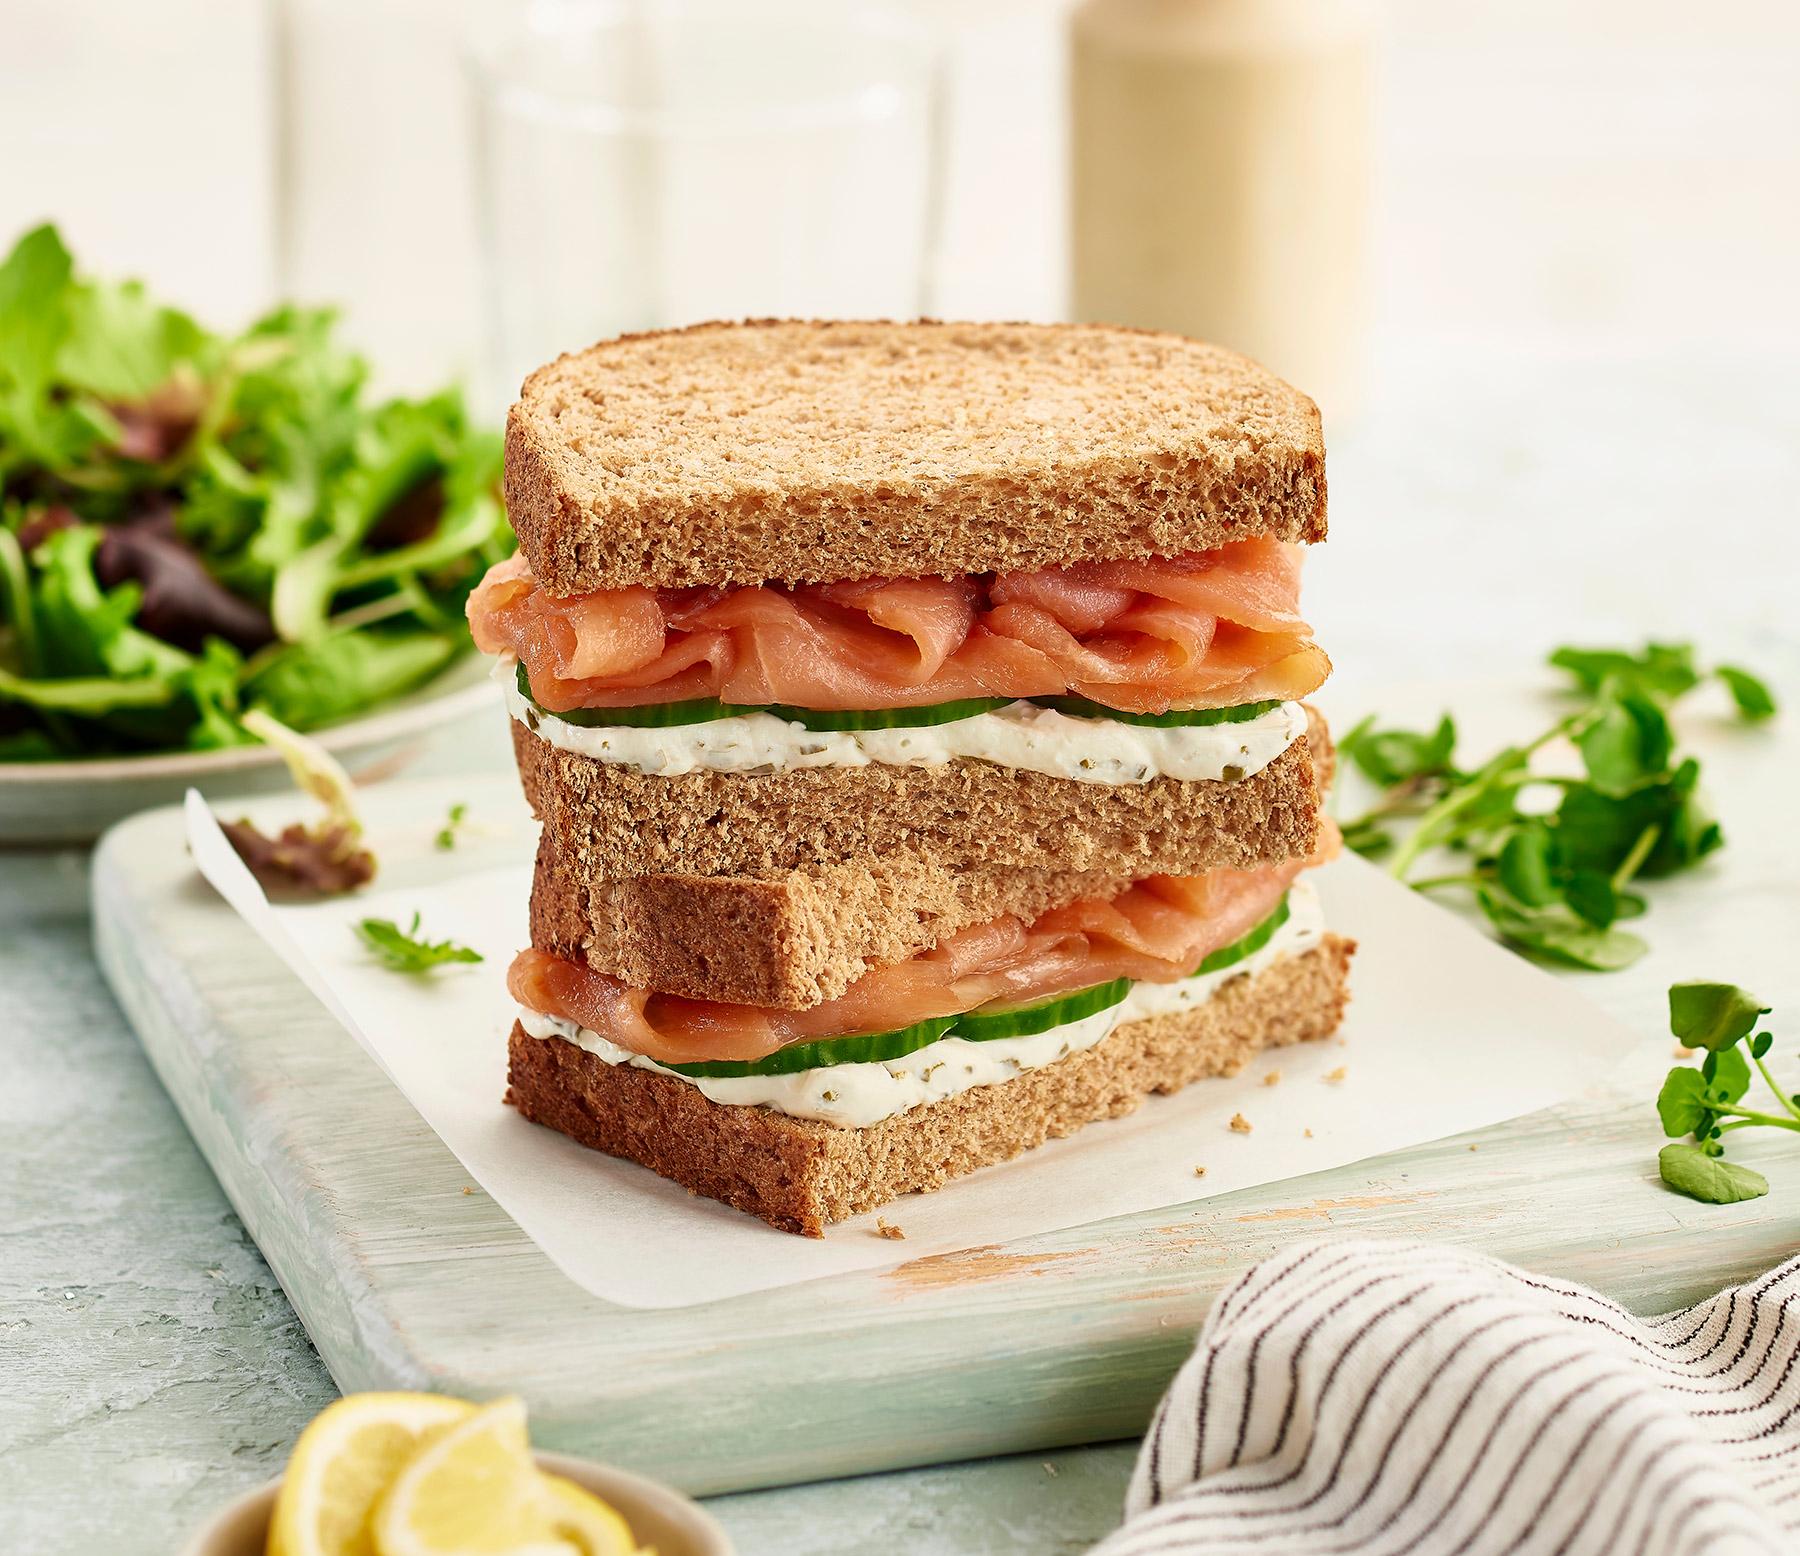 Philadelphia, and smoked salmon sandwich